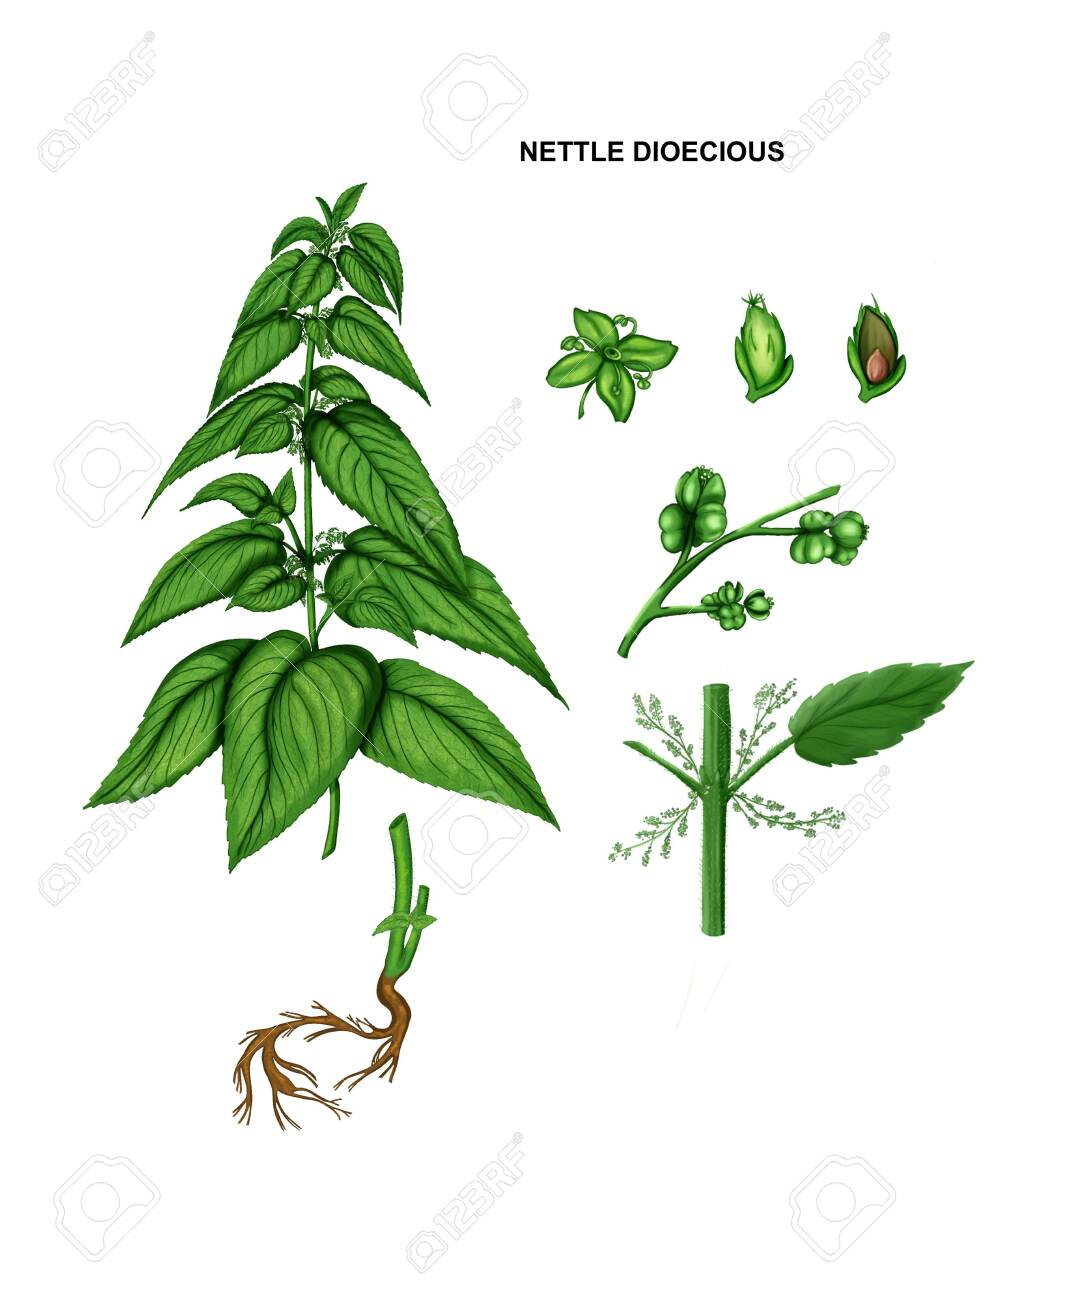 Illustration of nettle dioecious. Drug plant - 140353476